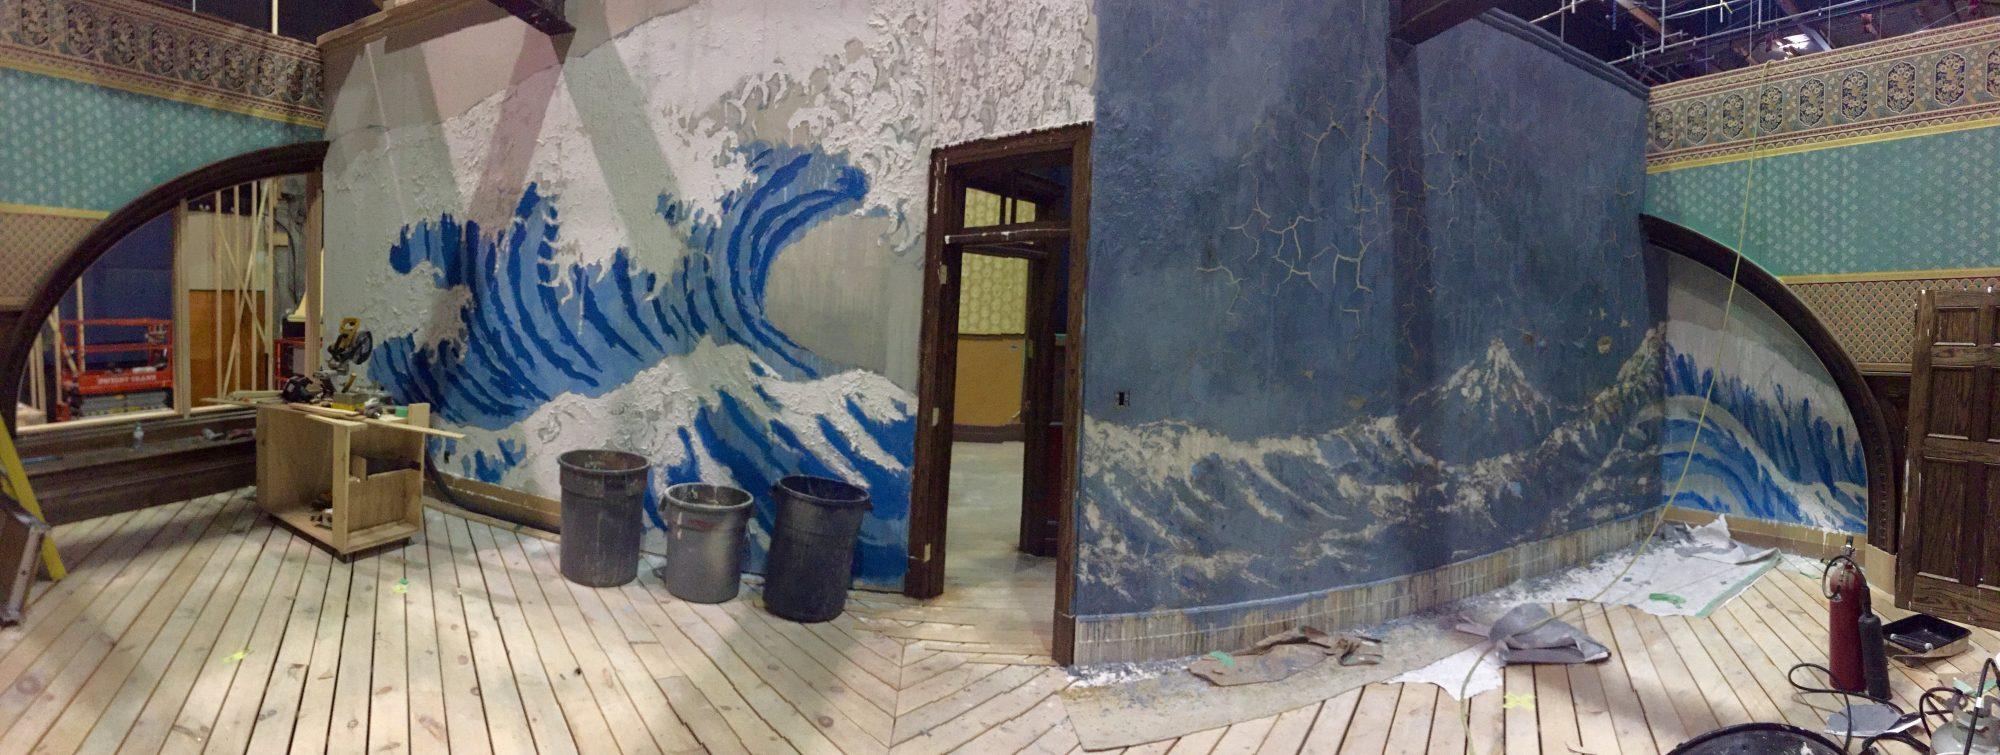 Wave wall progress 2